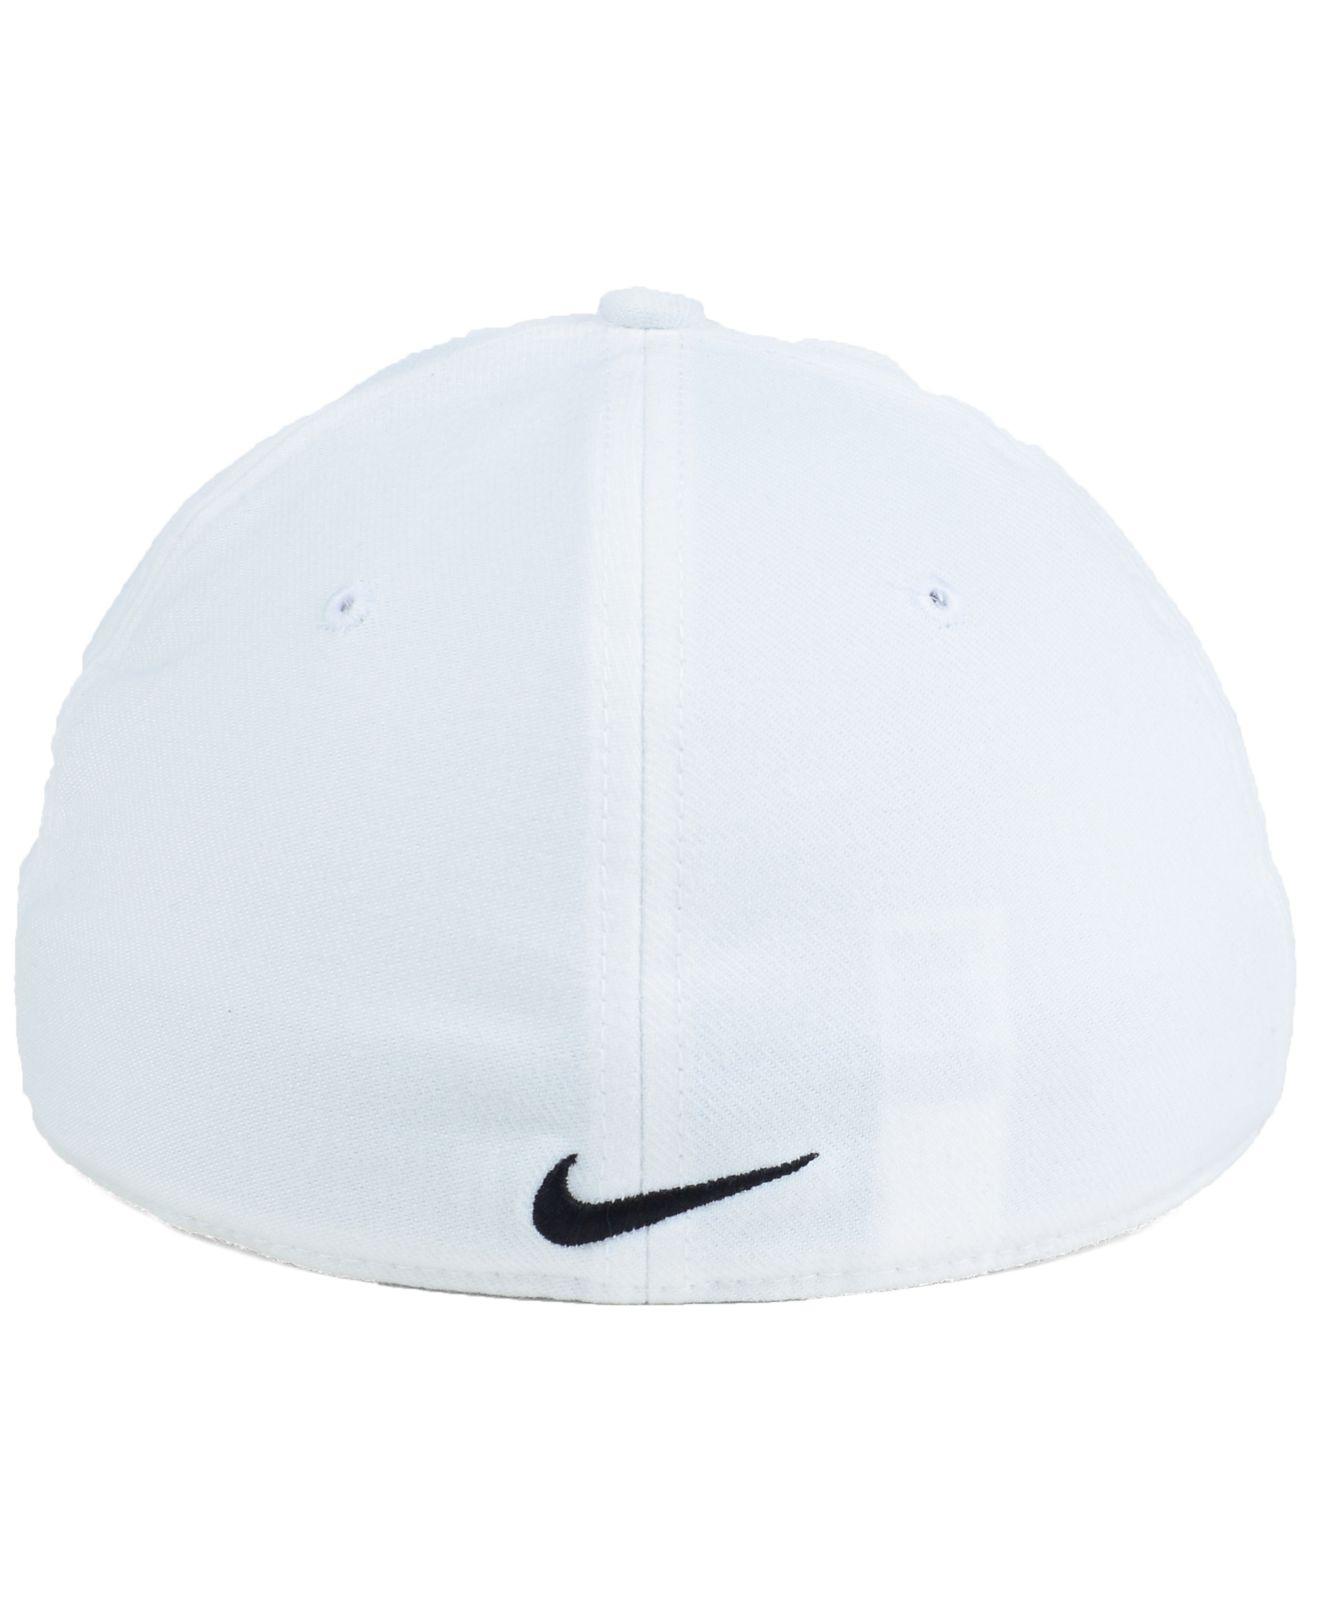 beb319b2b00 ... discount lyst nike colorado buffaloes dri fit swooshflex cap in white  for men 44bda f119e